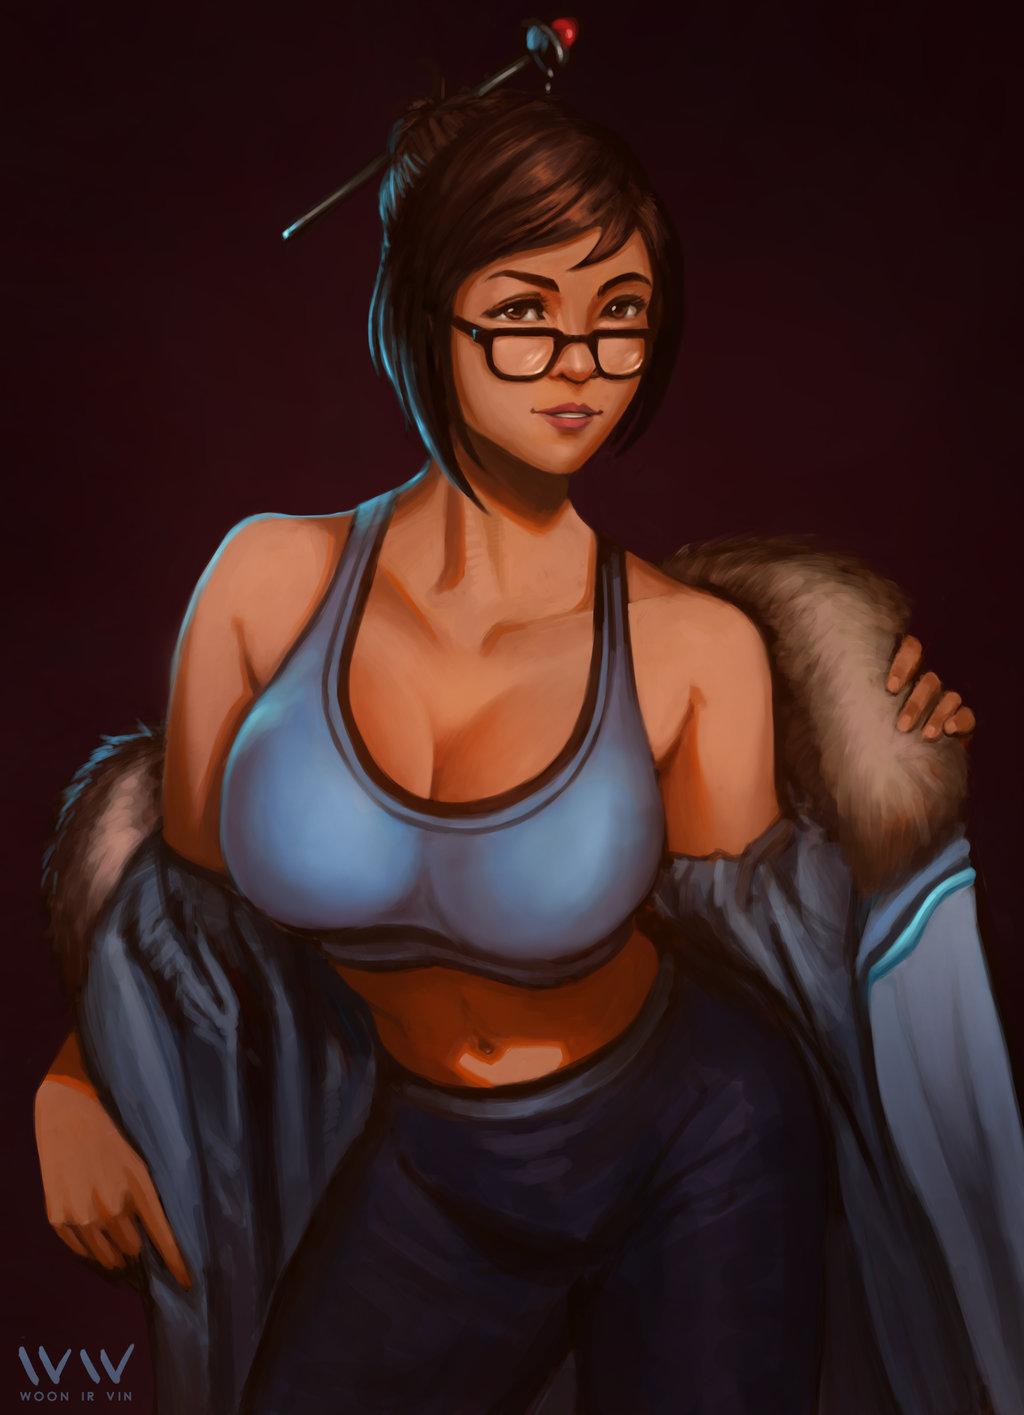 overwatch-mei-art-sexy : Gameplaying